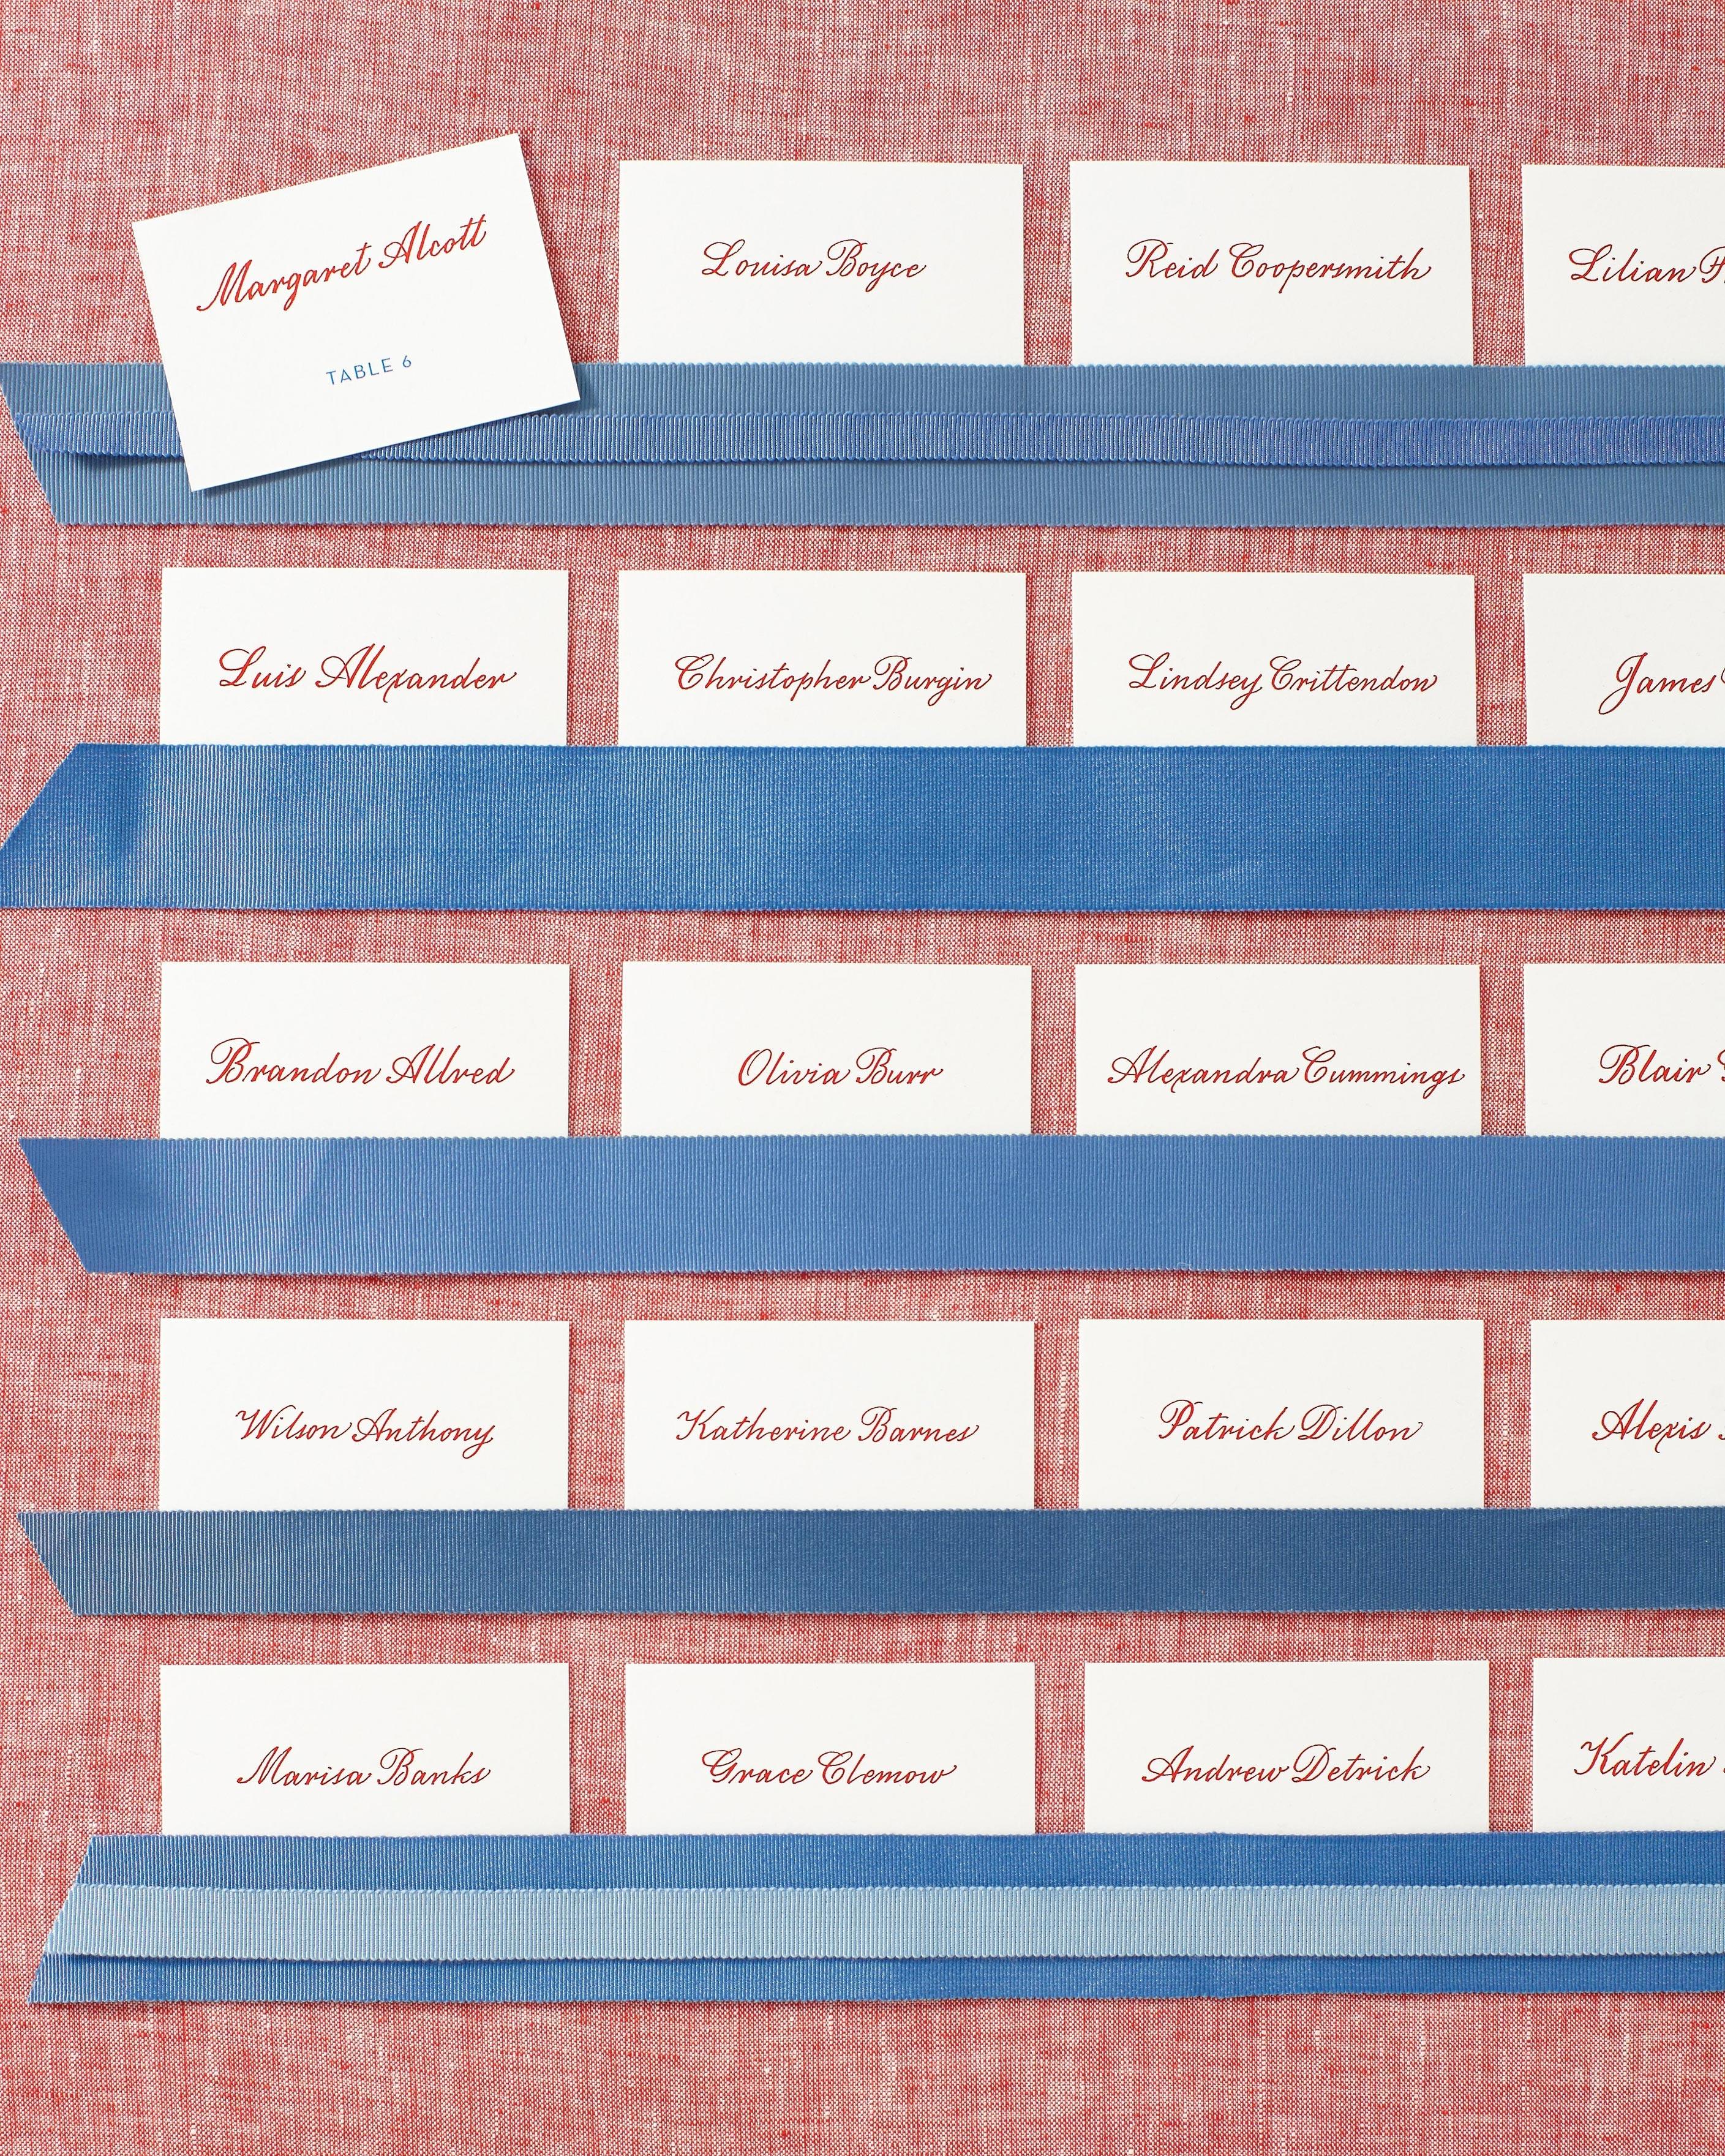 blue-red-wedding-colors-escort-cards-041-d112667.jpg